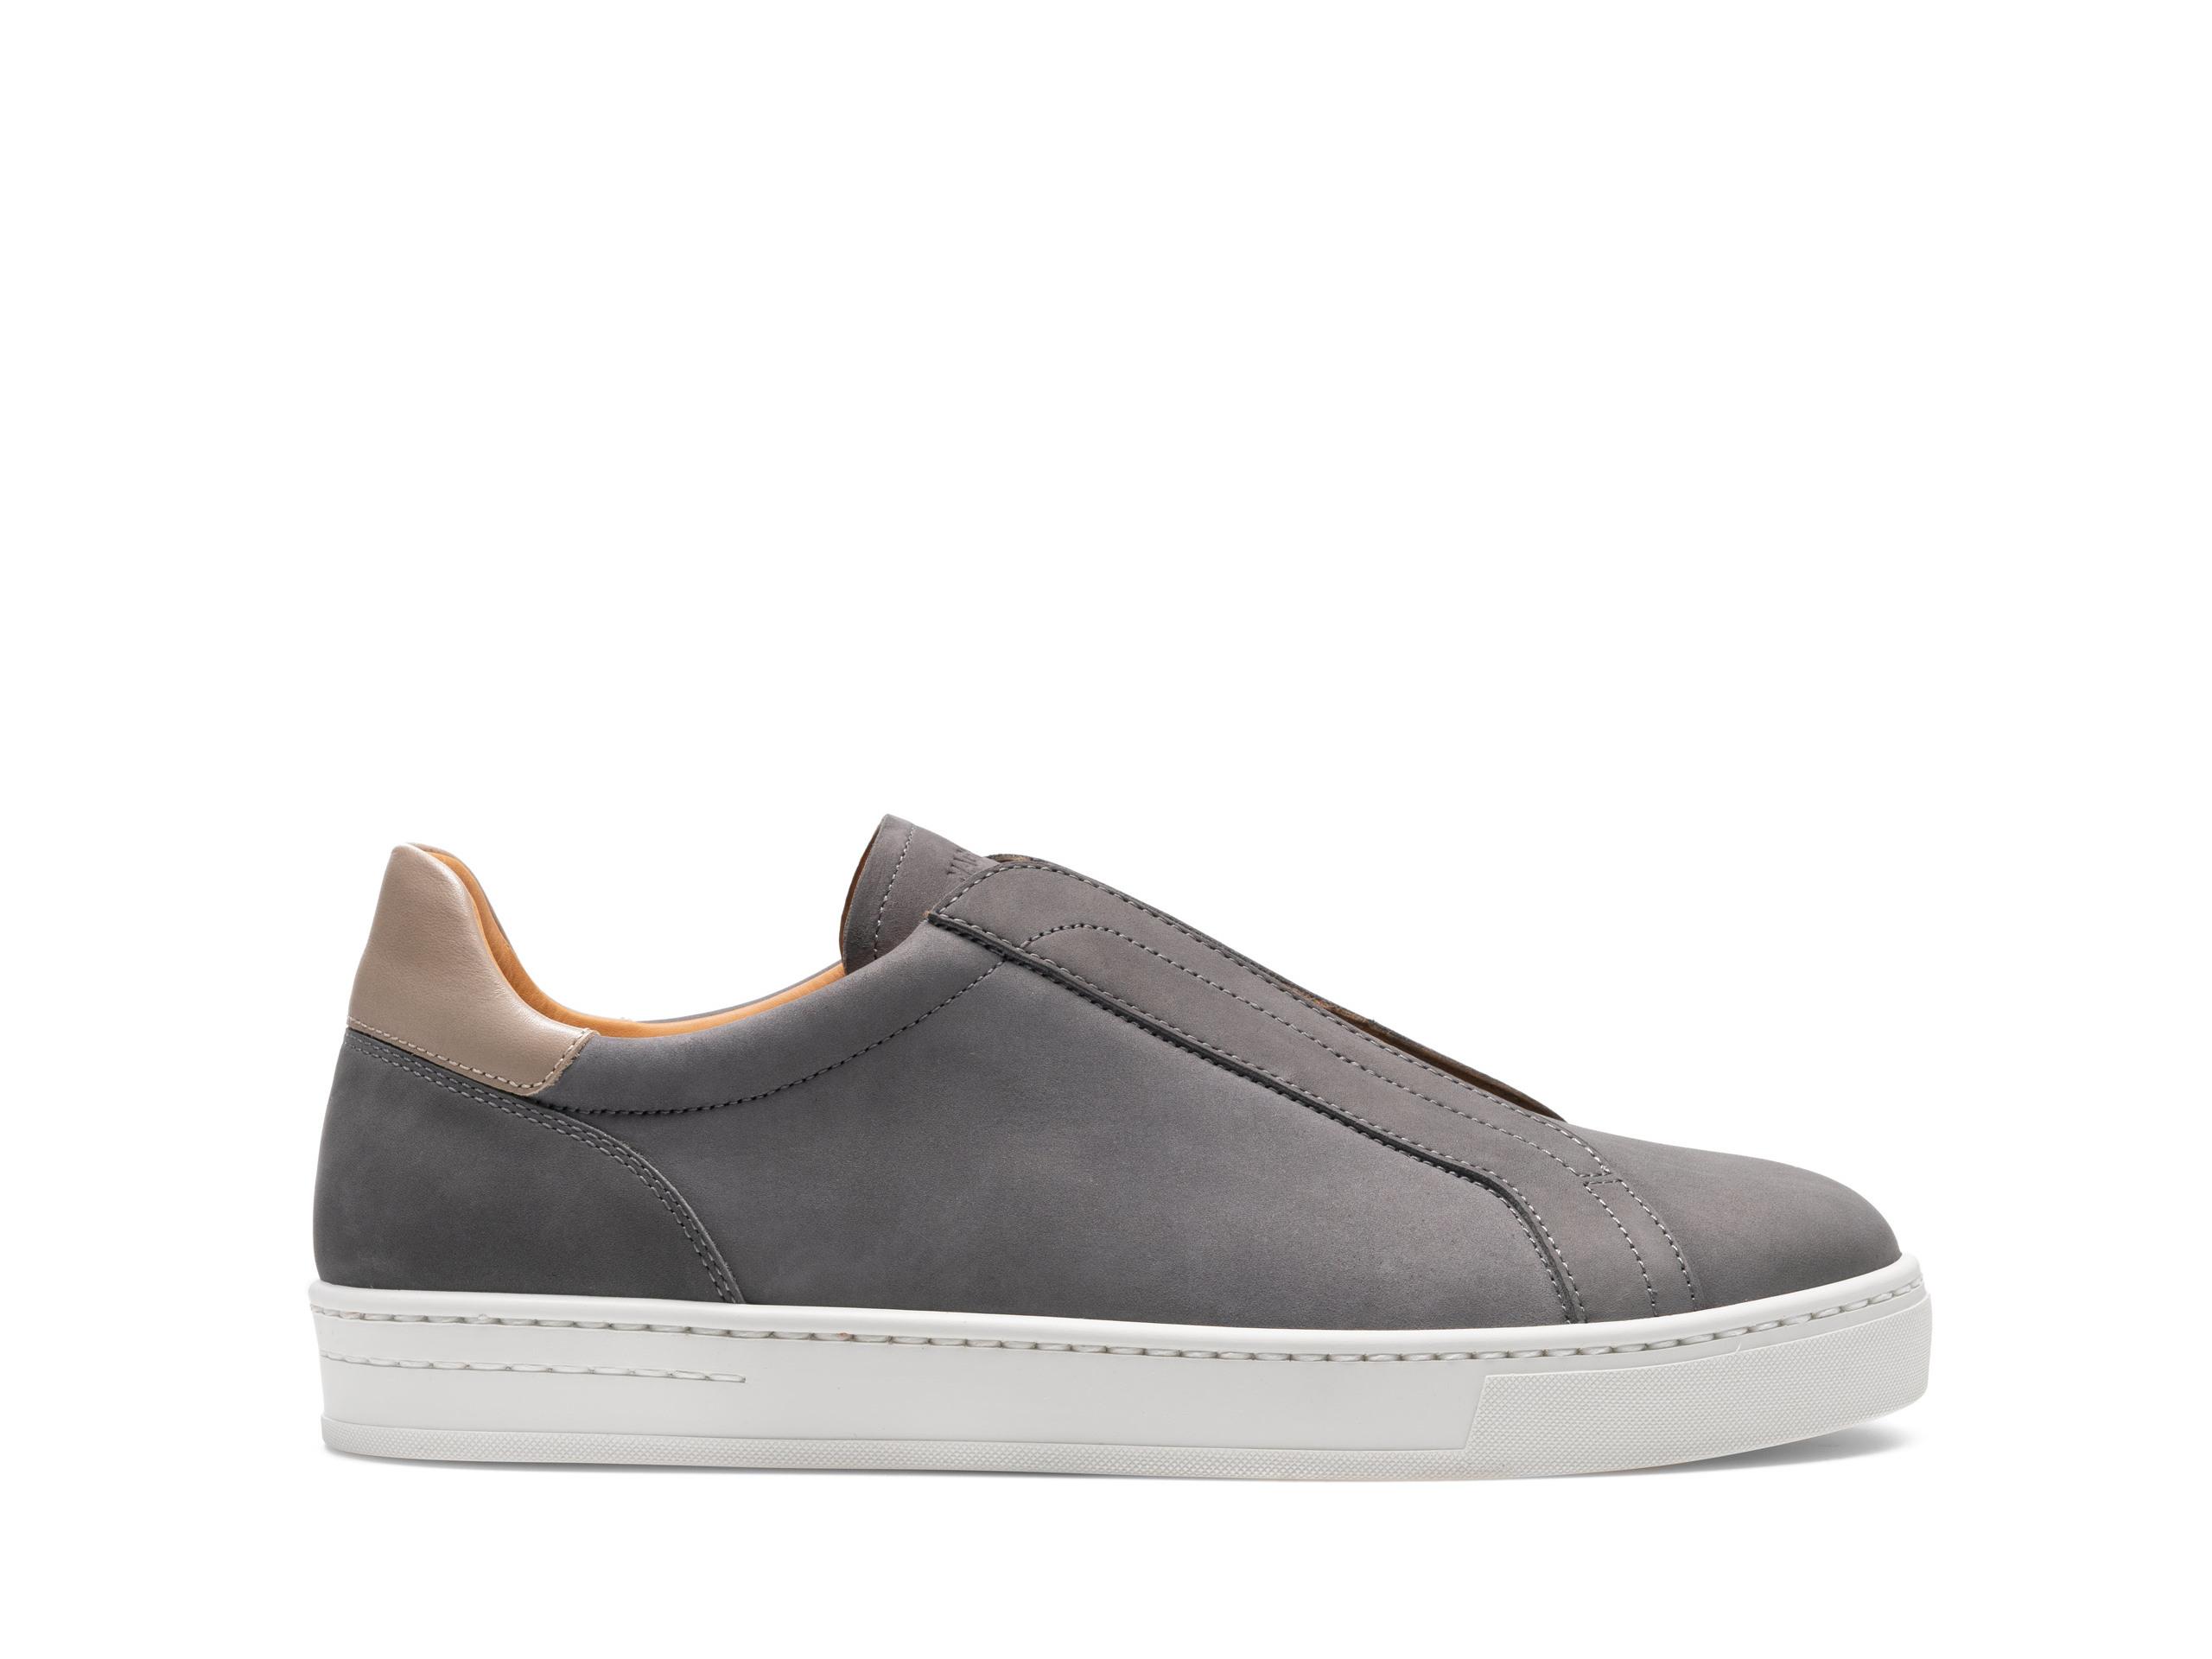 Side Profile of Gasol Grey Suede Sneakers